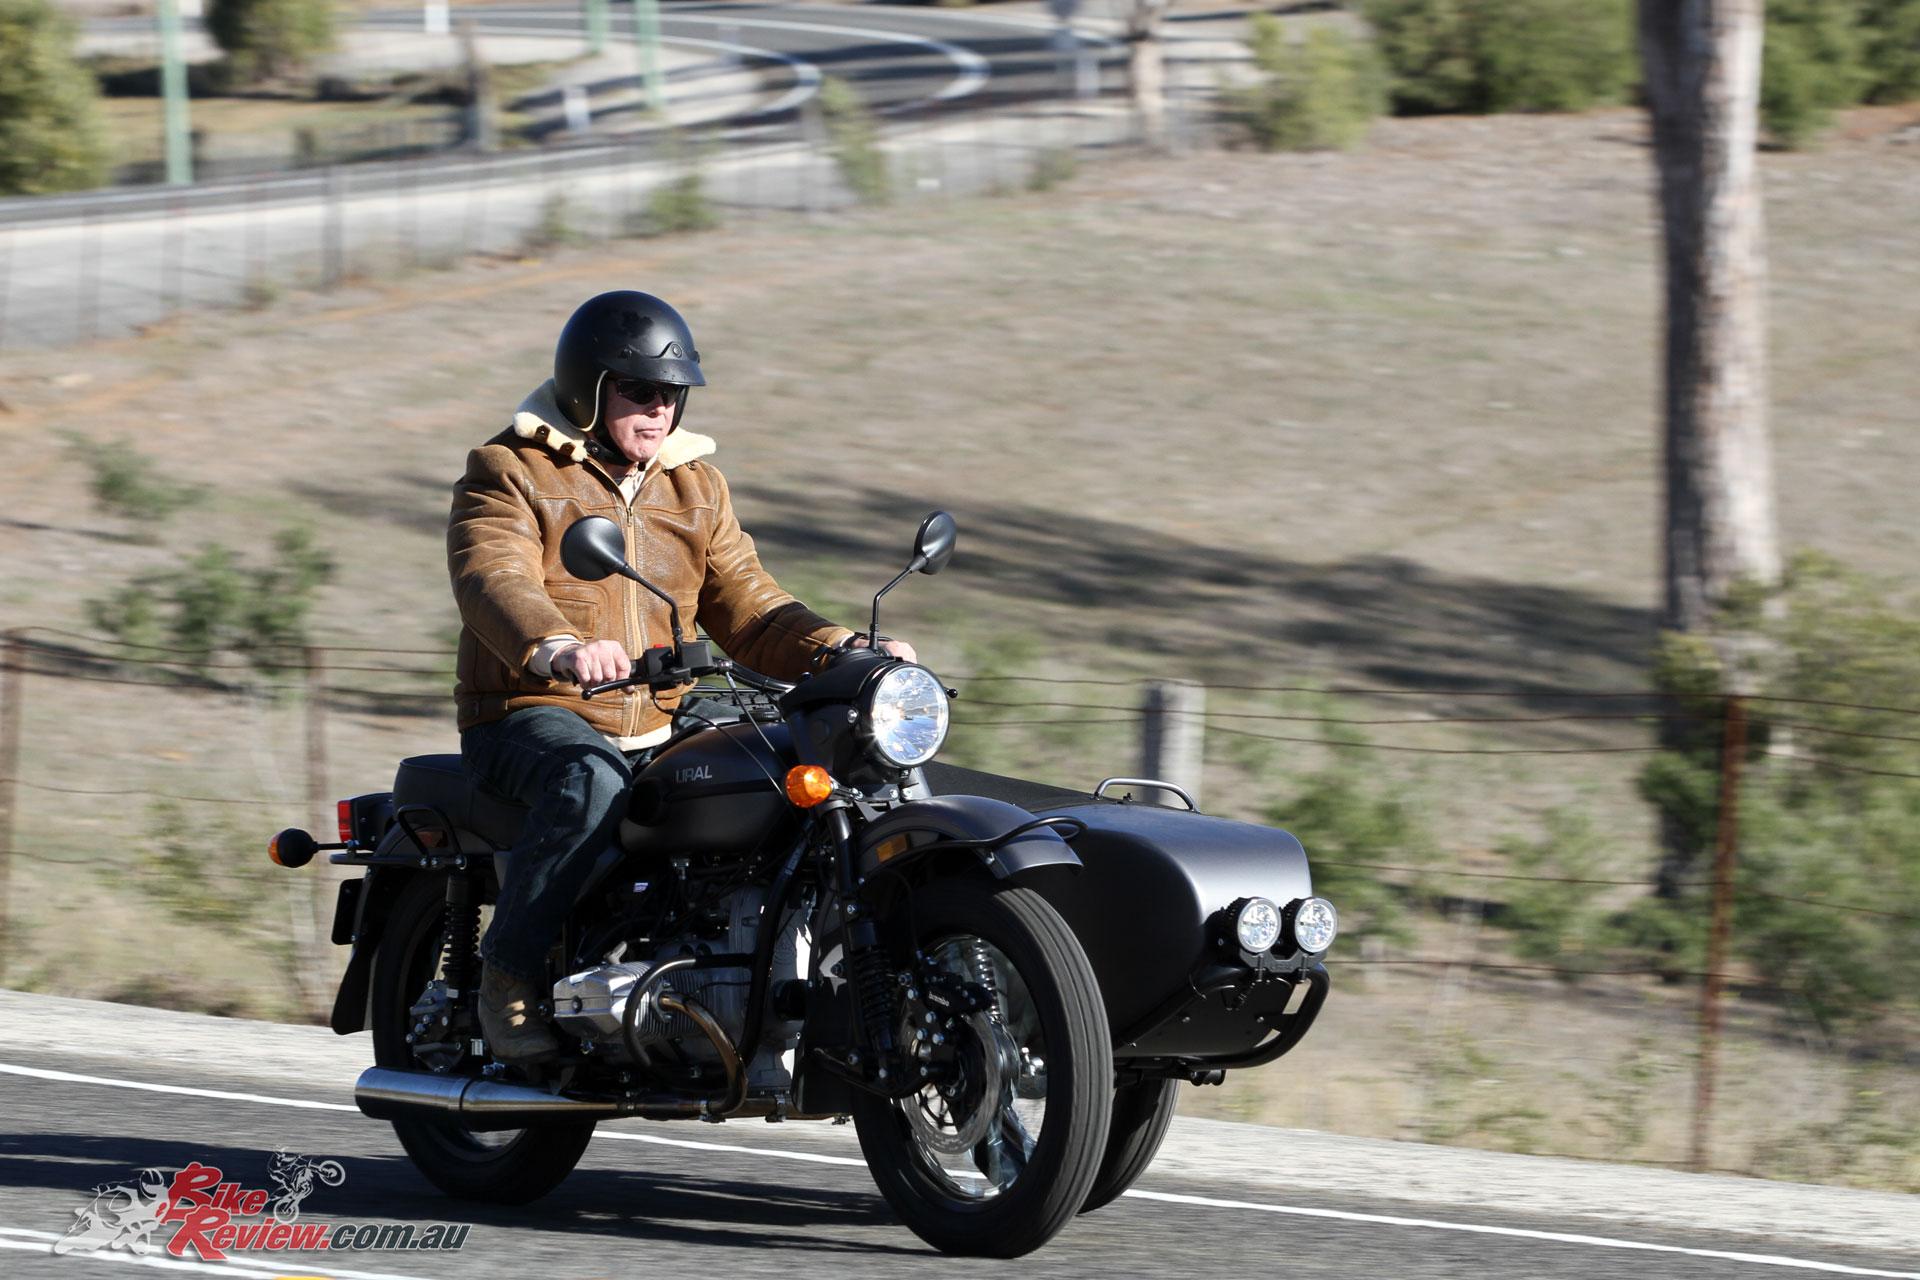 The Ural Ranger boasts a kit designed for off-road use